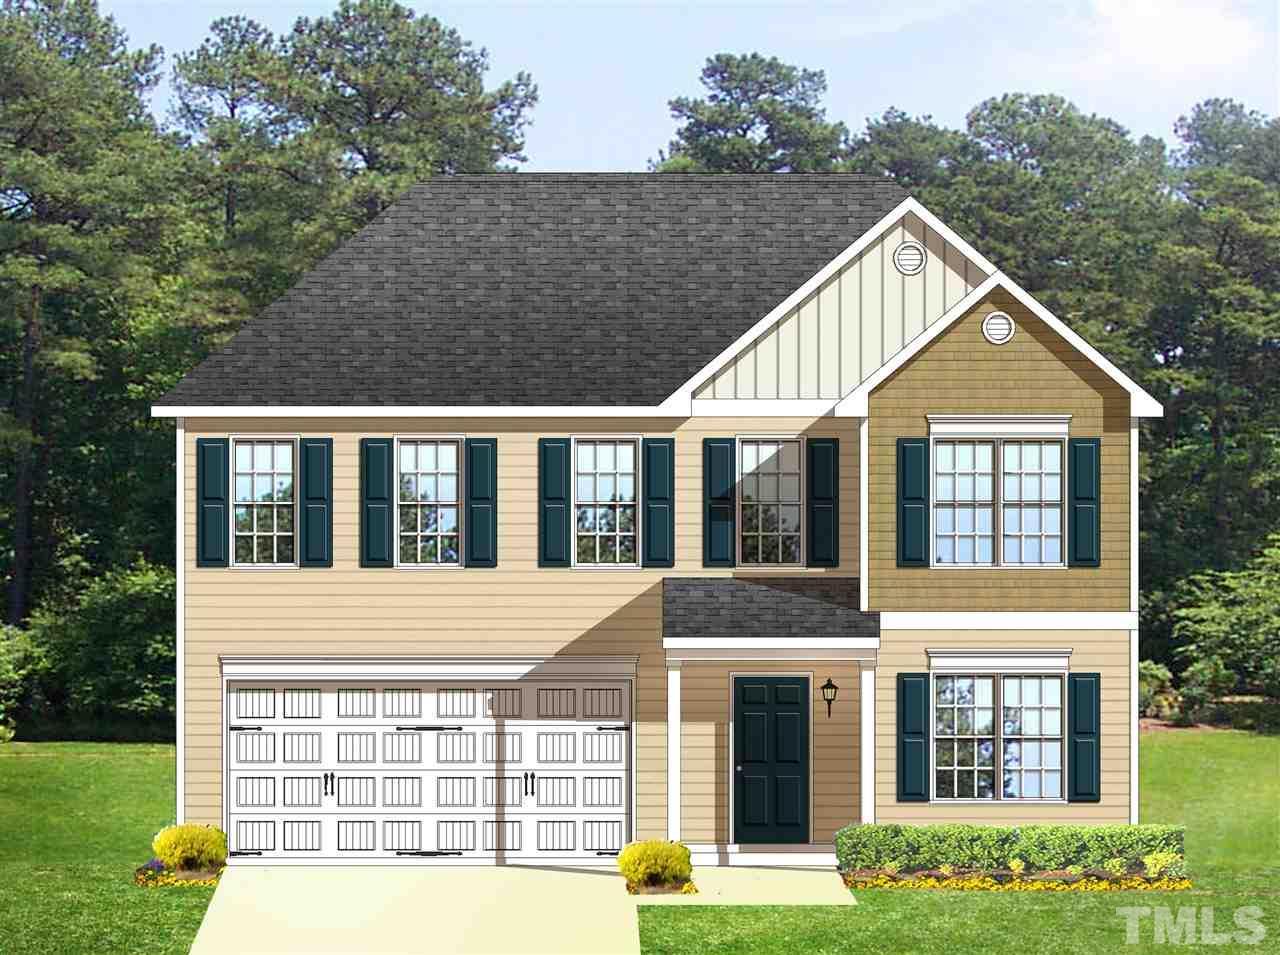 50 MEADOW HILLS Drive 28, Four Oaks, NC 27524